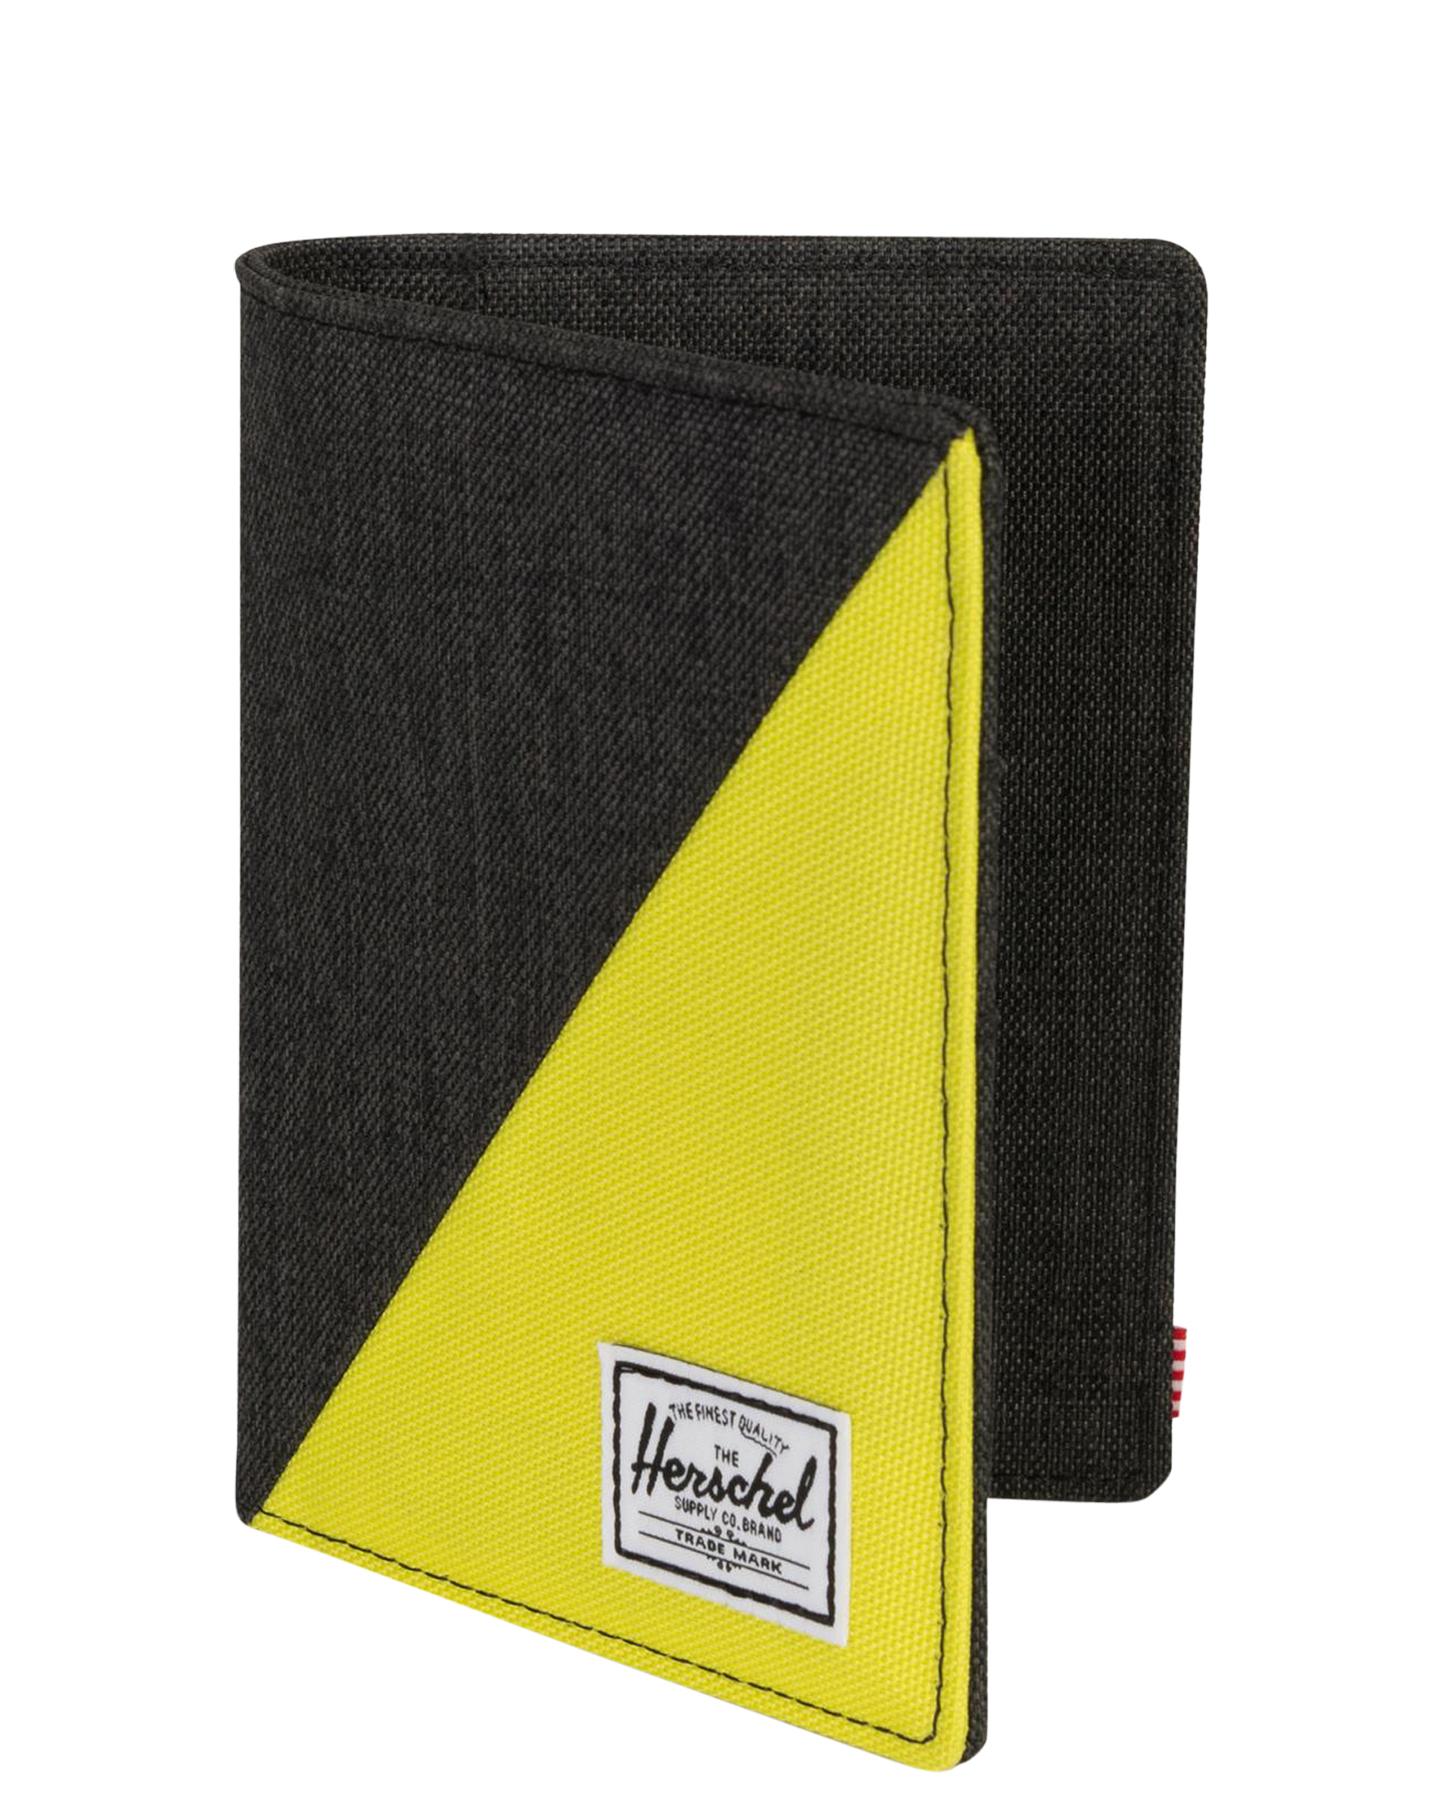 New Herschel Supply Co Men s Raynor Passport Holder Rfid Black ... 9434eb1f83684